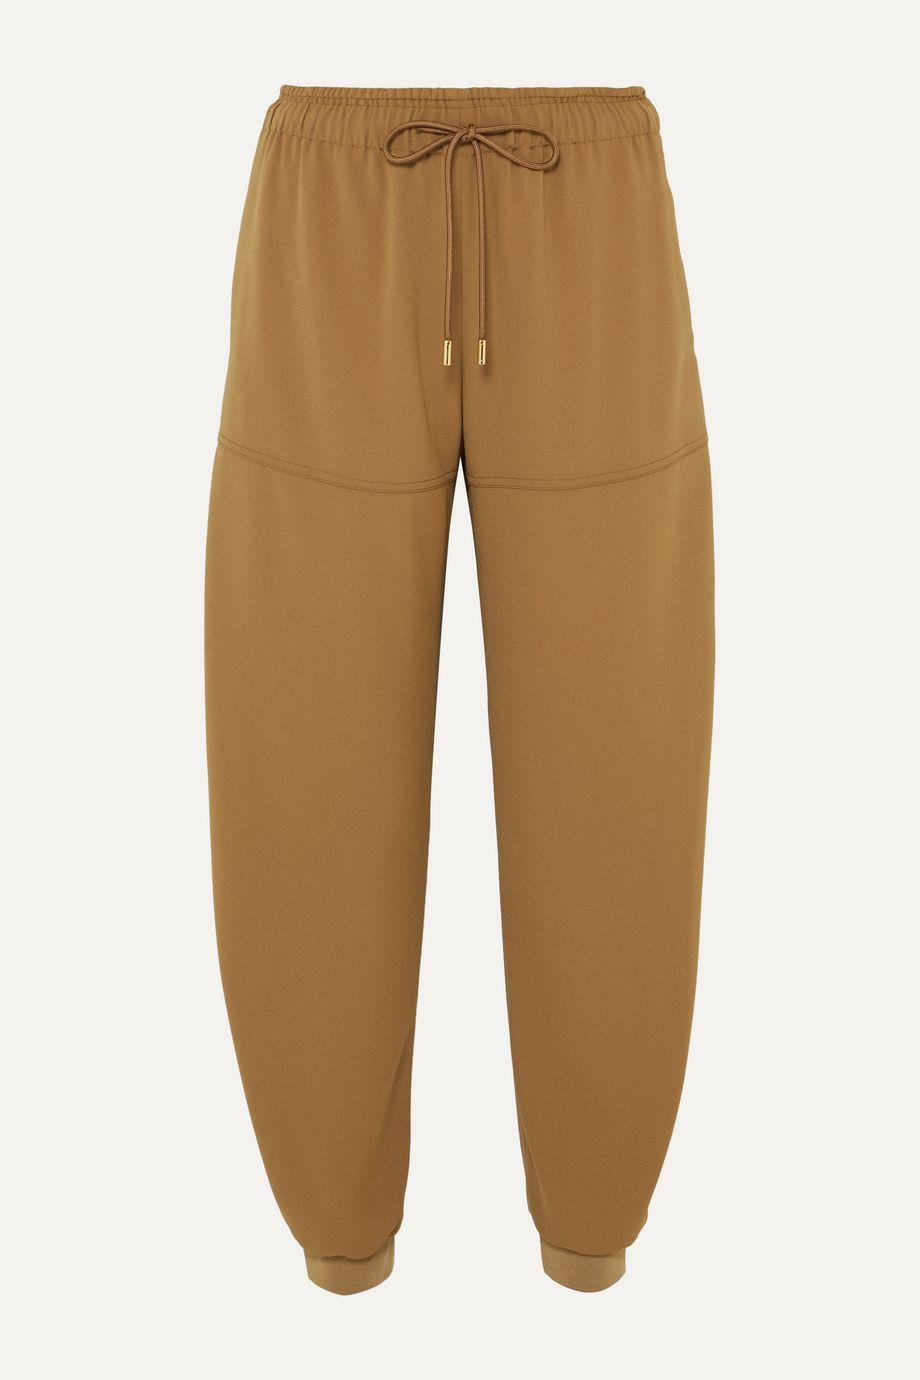 Chloé Satin-jersey tapered track pants